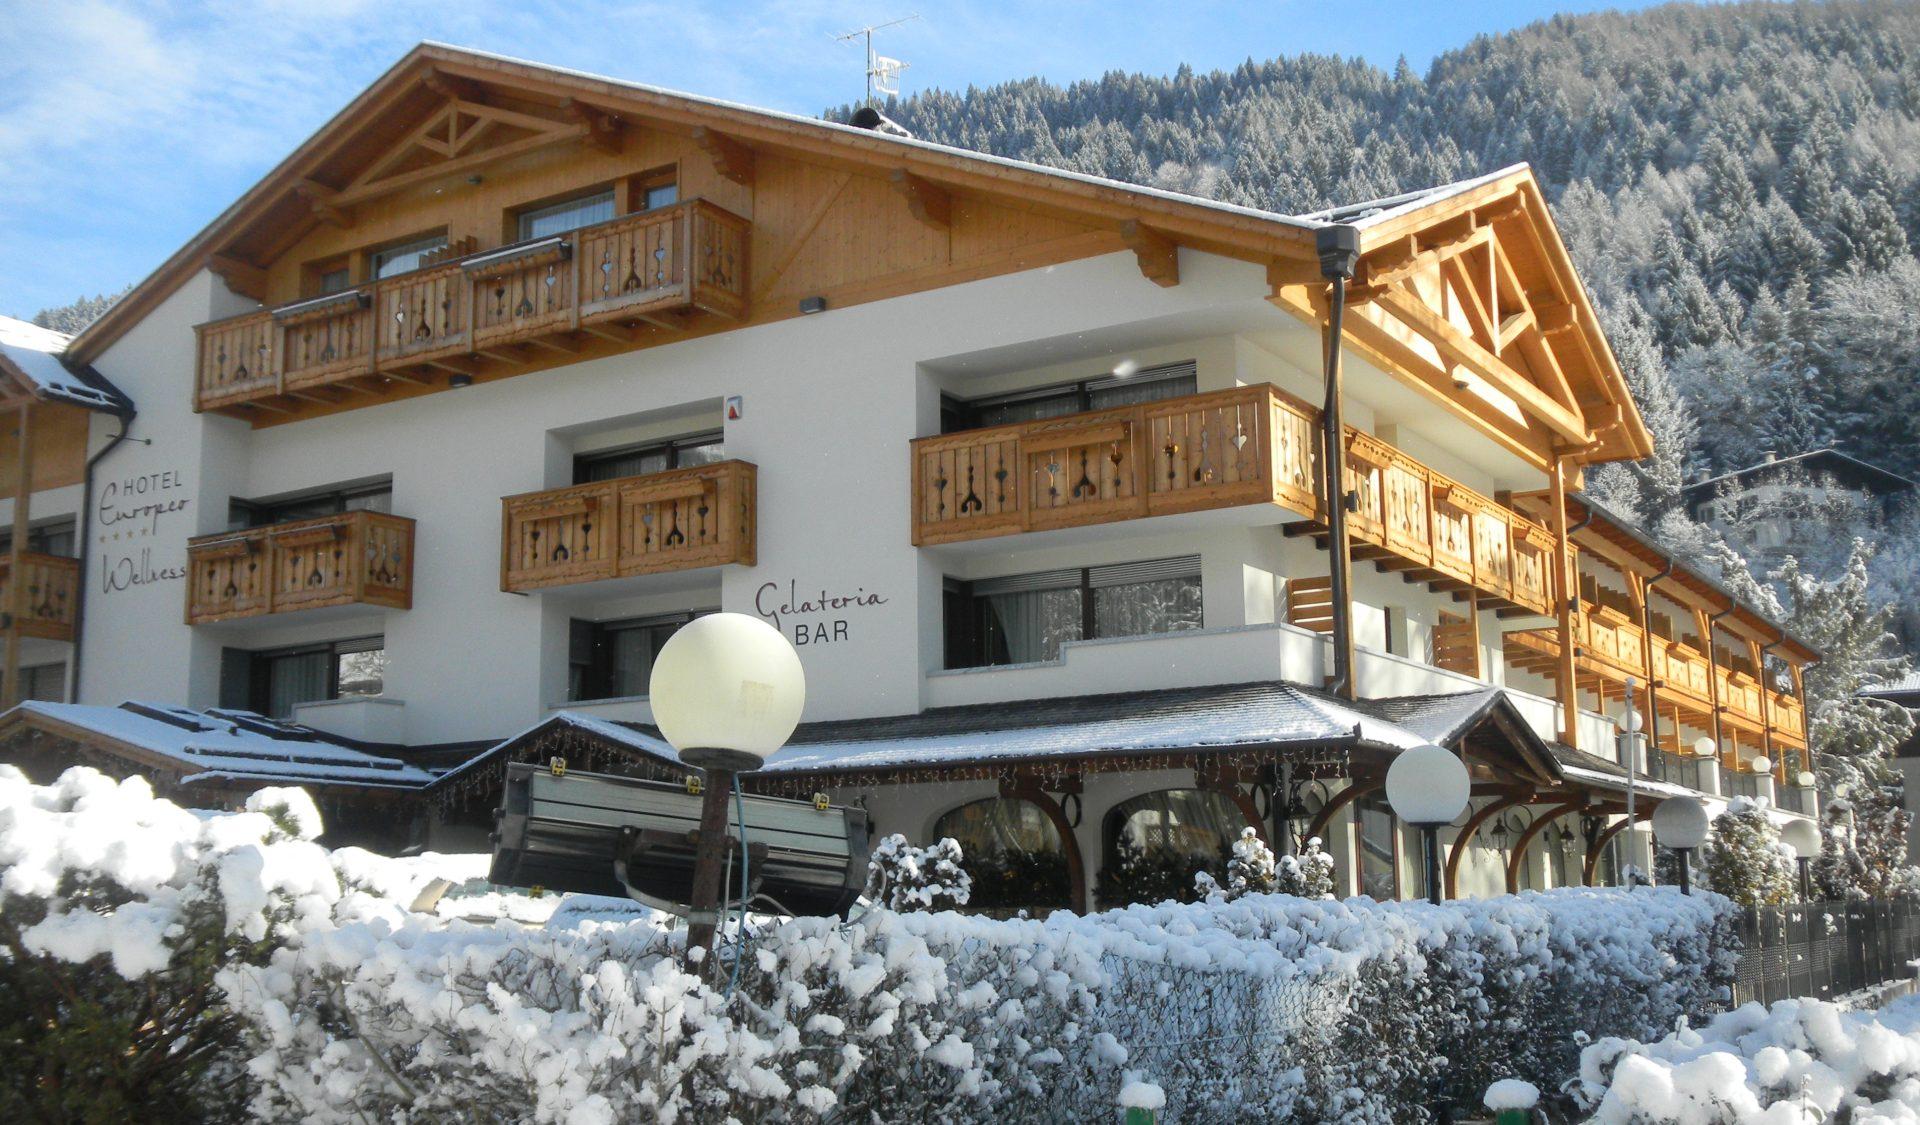 Hotel Europeo Pinzolo im Winter